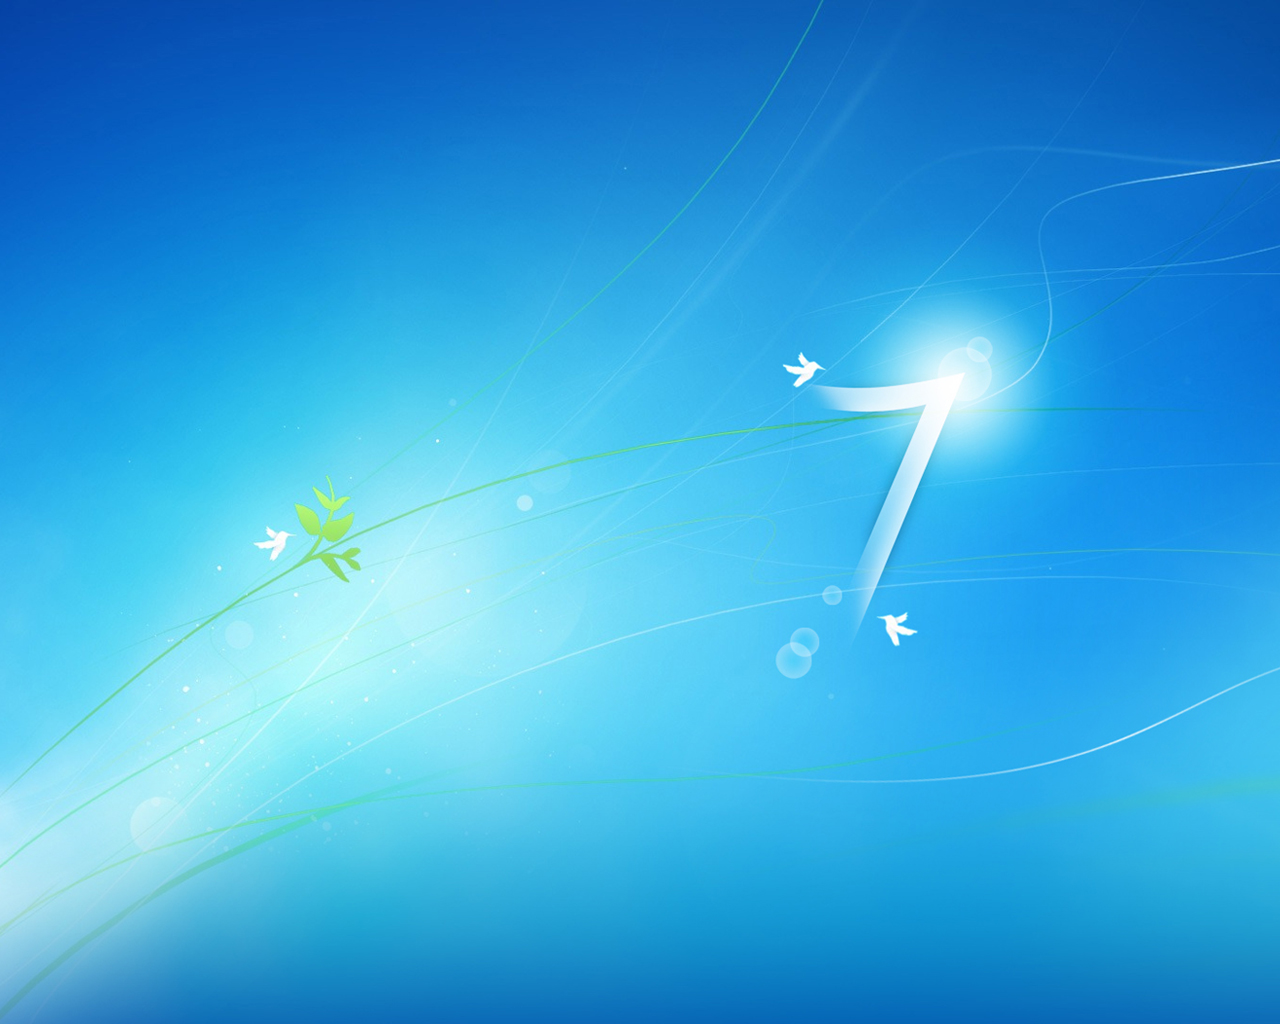 Wallpaper download microsoft - Free Wallpaper Download Top 10 Microsoft Windows 7 Wallpaper Hd